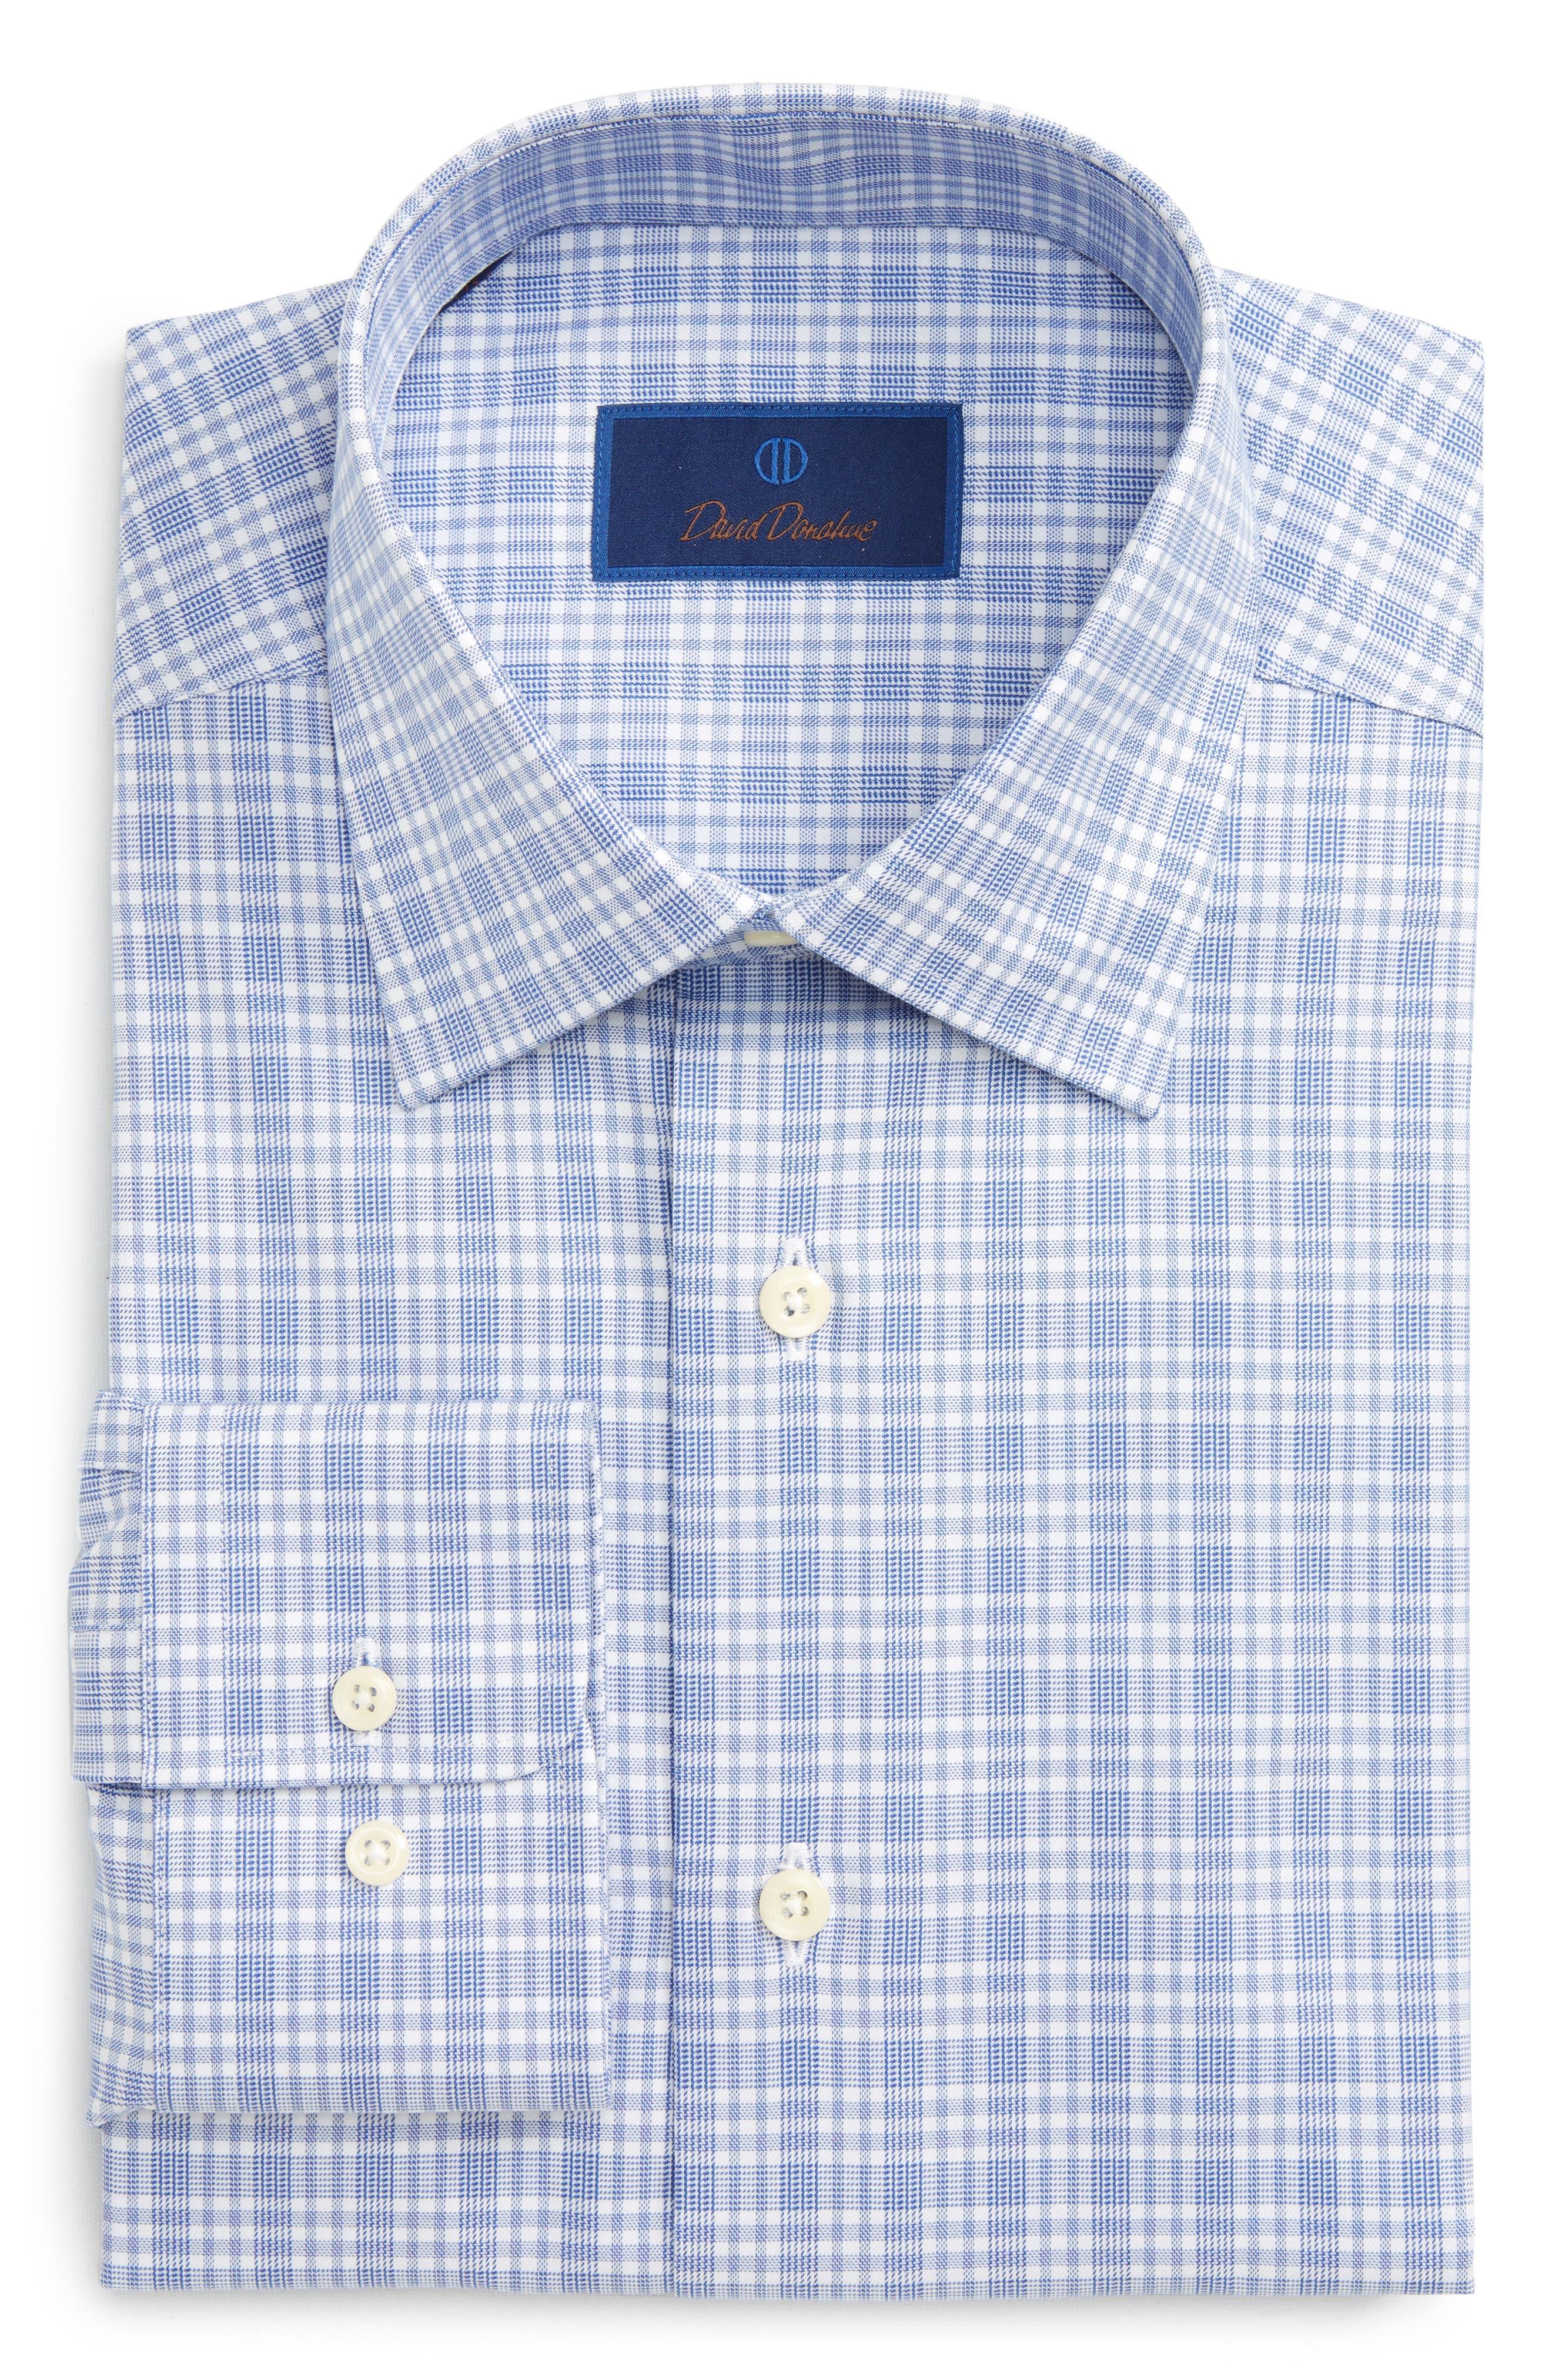 Main Image - David Donahue Regular Fit Plaid Dress Shirt